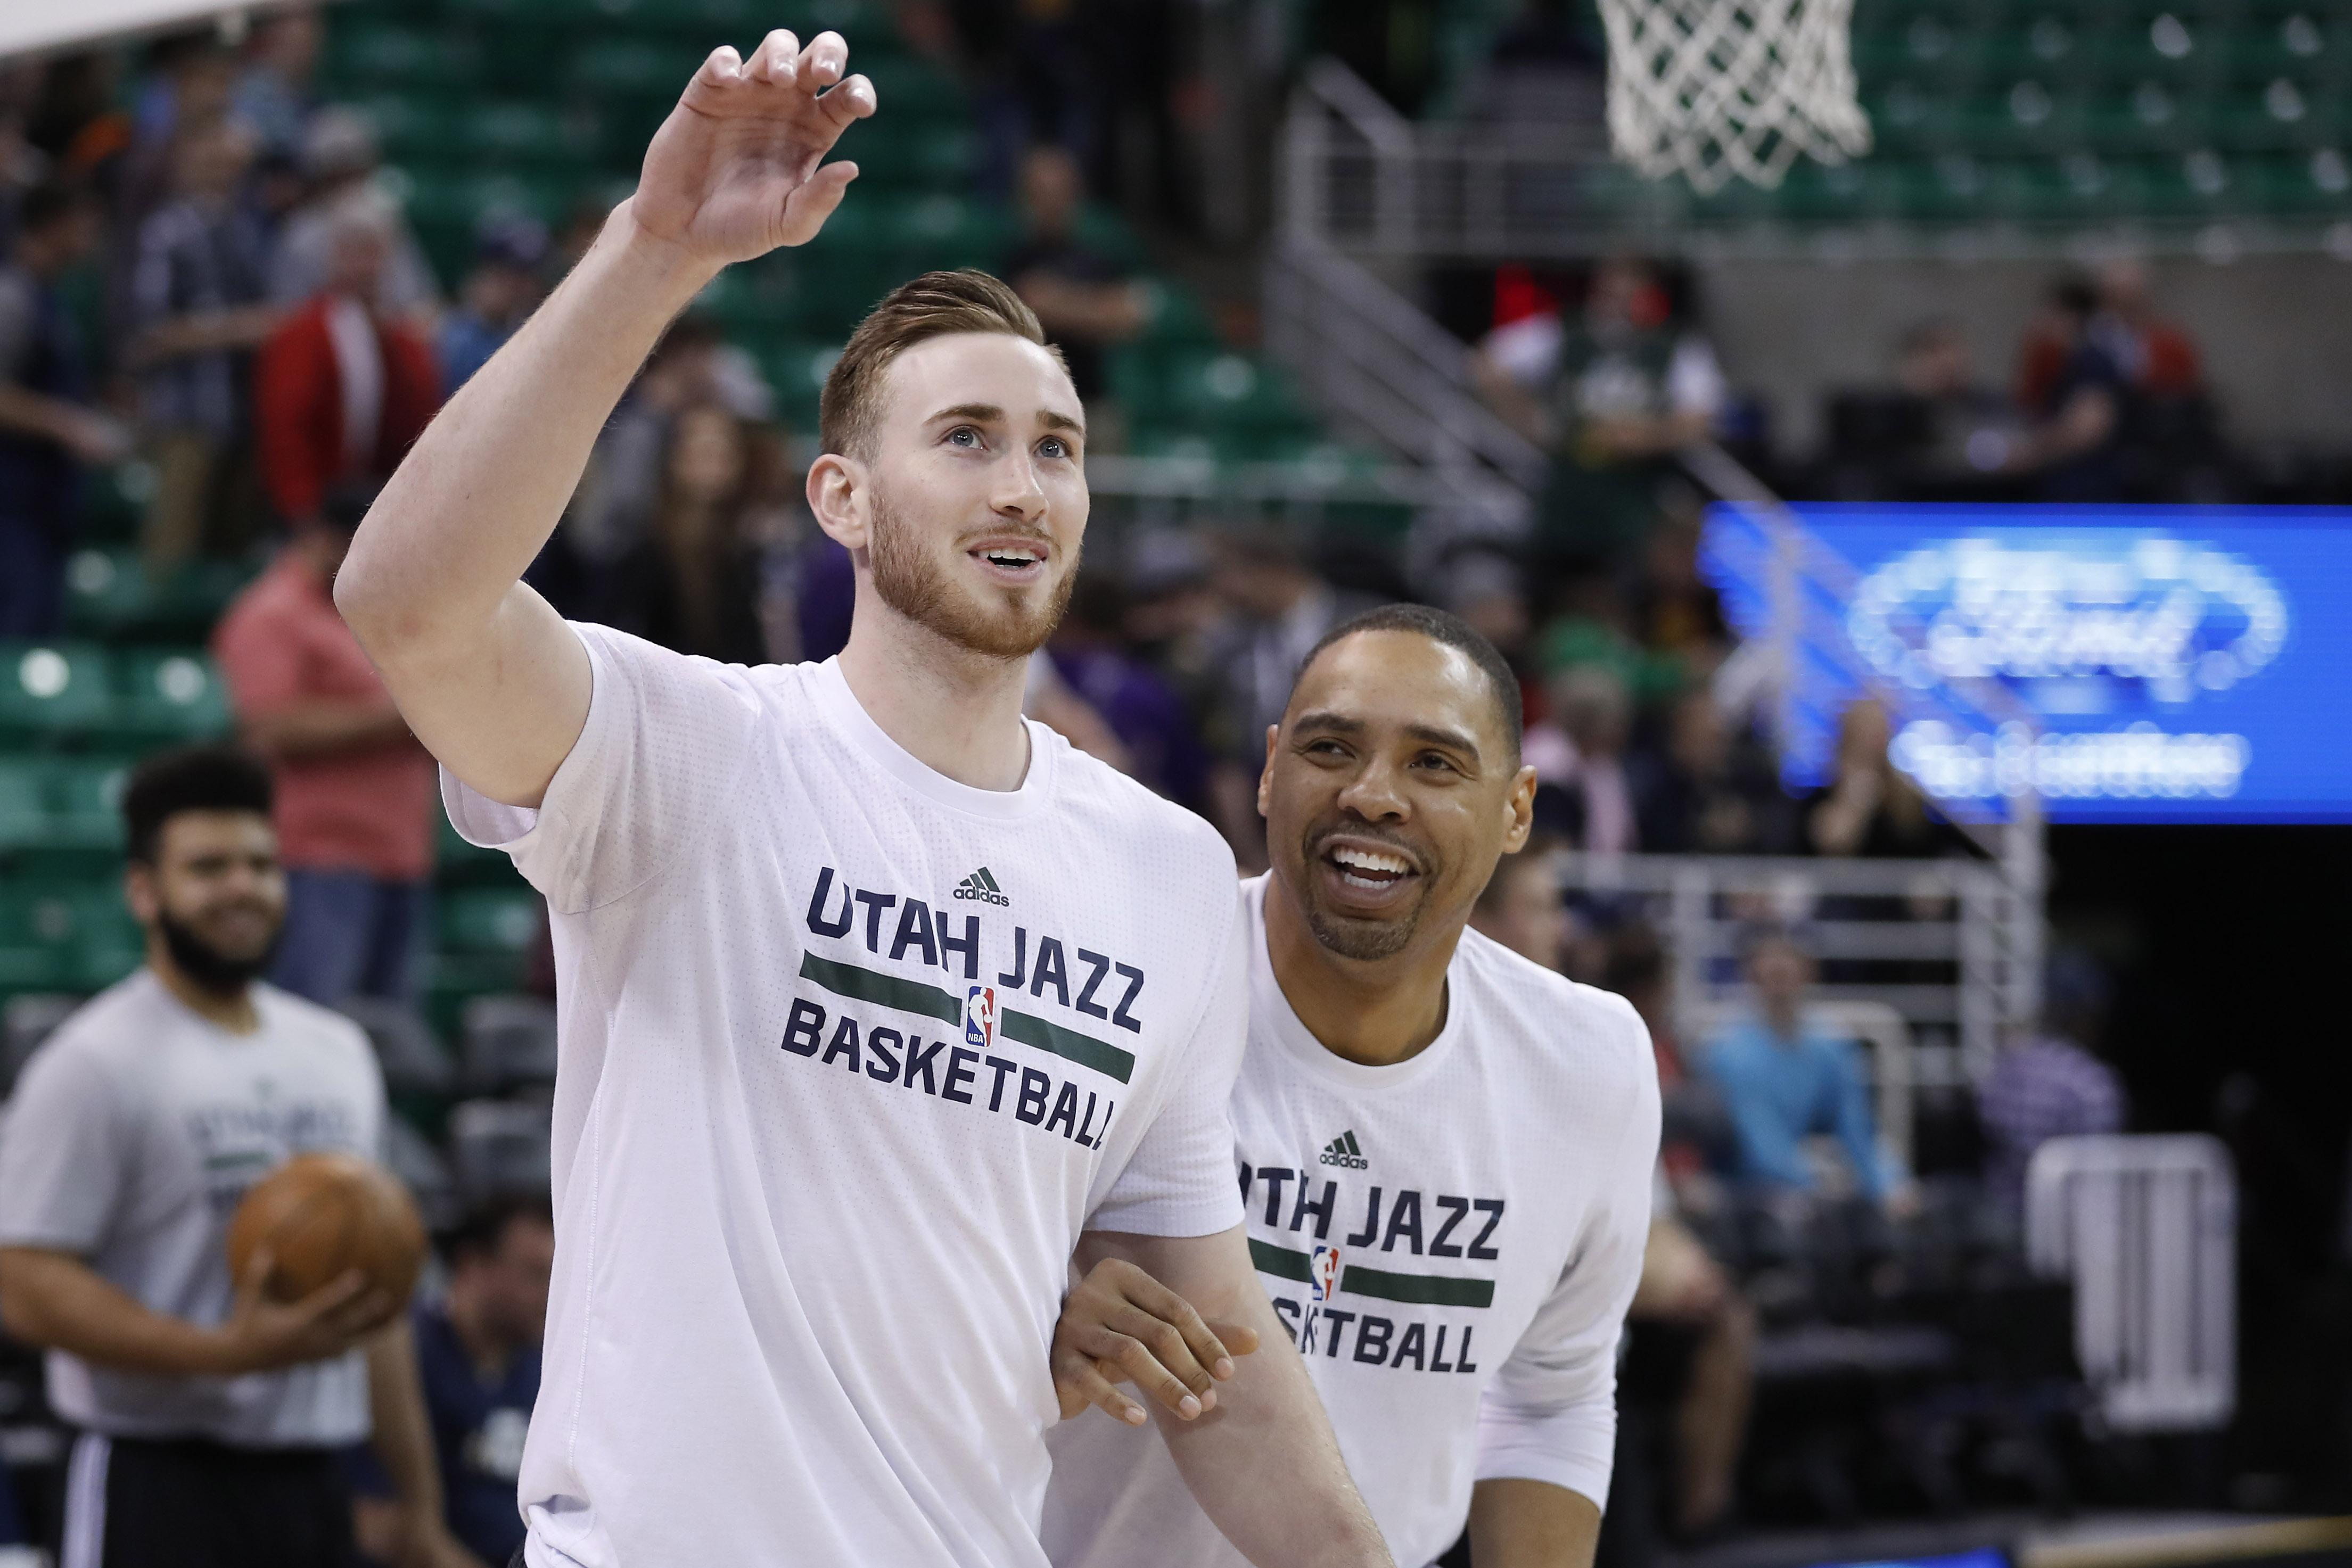 NBA: Minnesota Timberwolves at Utah Jazz